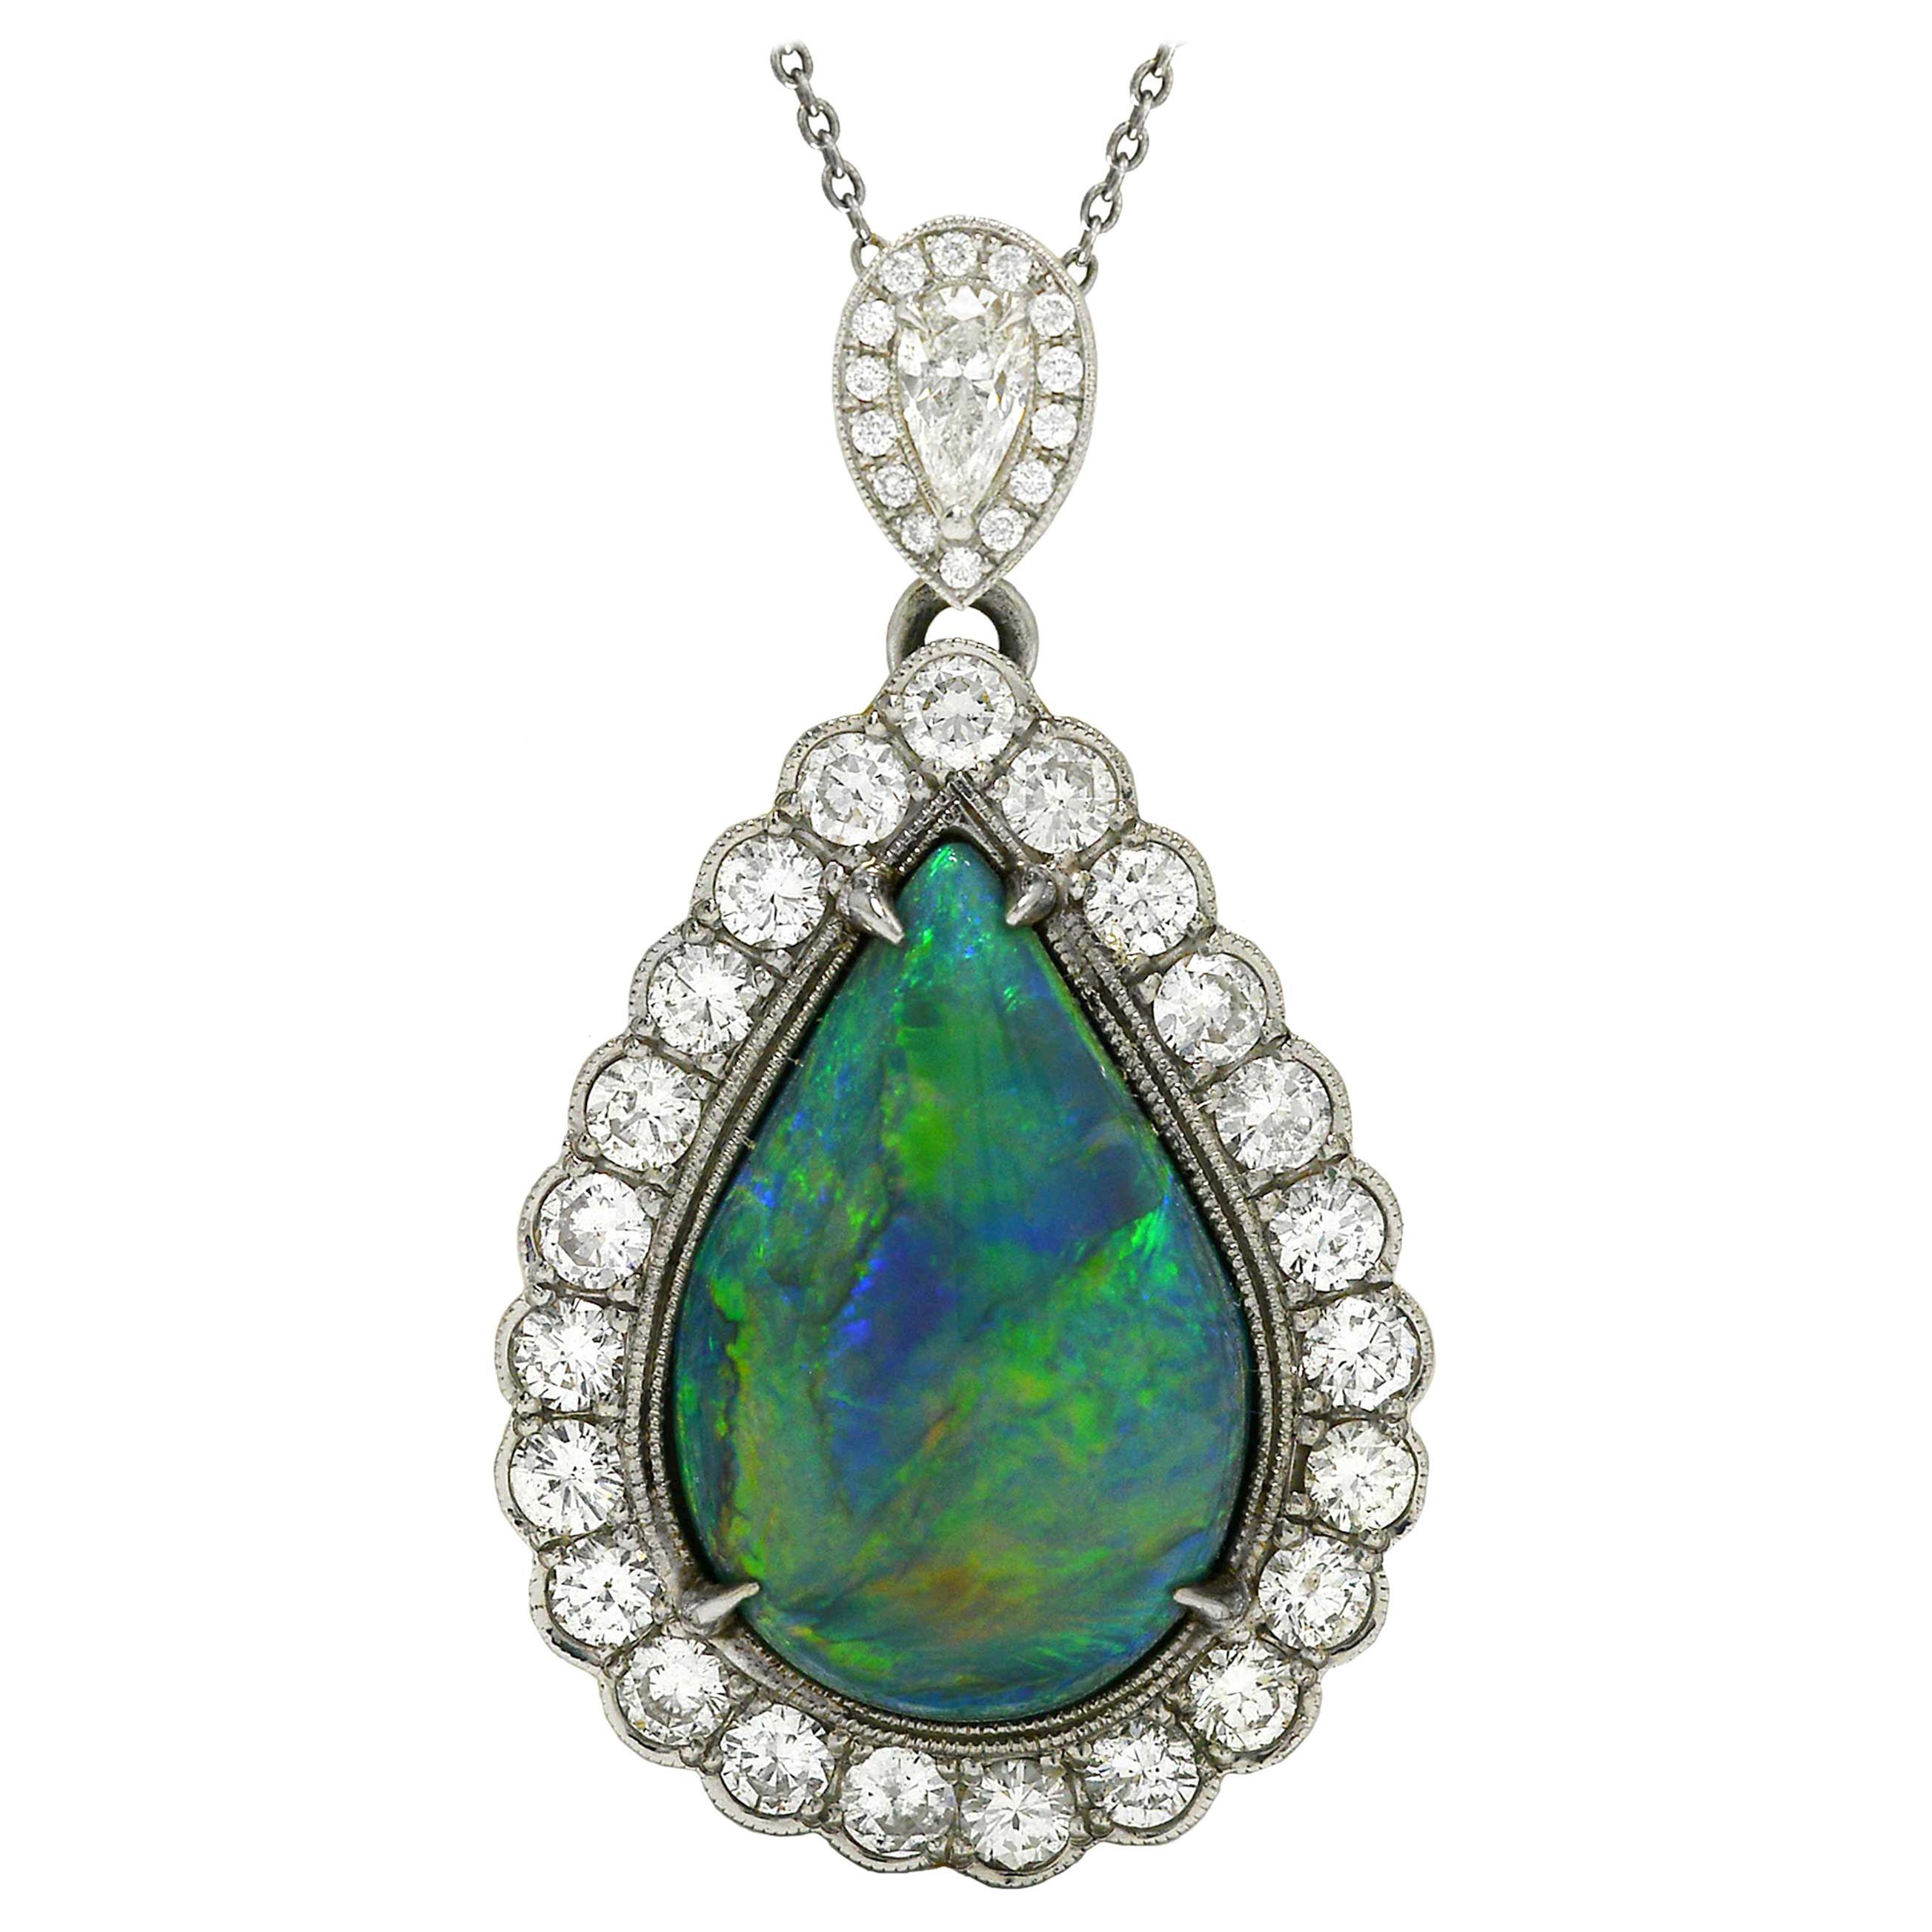 Important 16 Carat Black Opal and Diamond Necklace Pendant Australian Pinfire